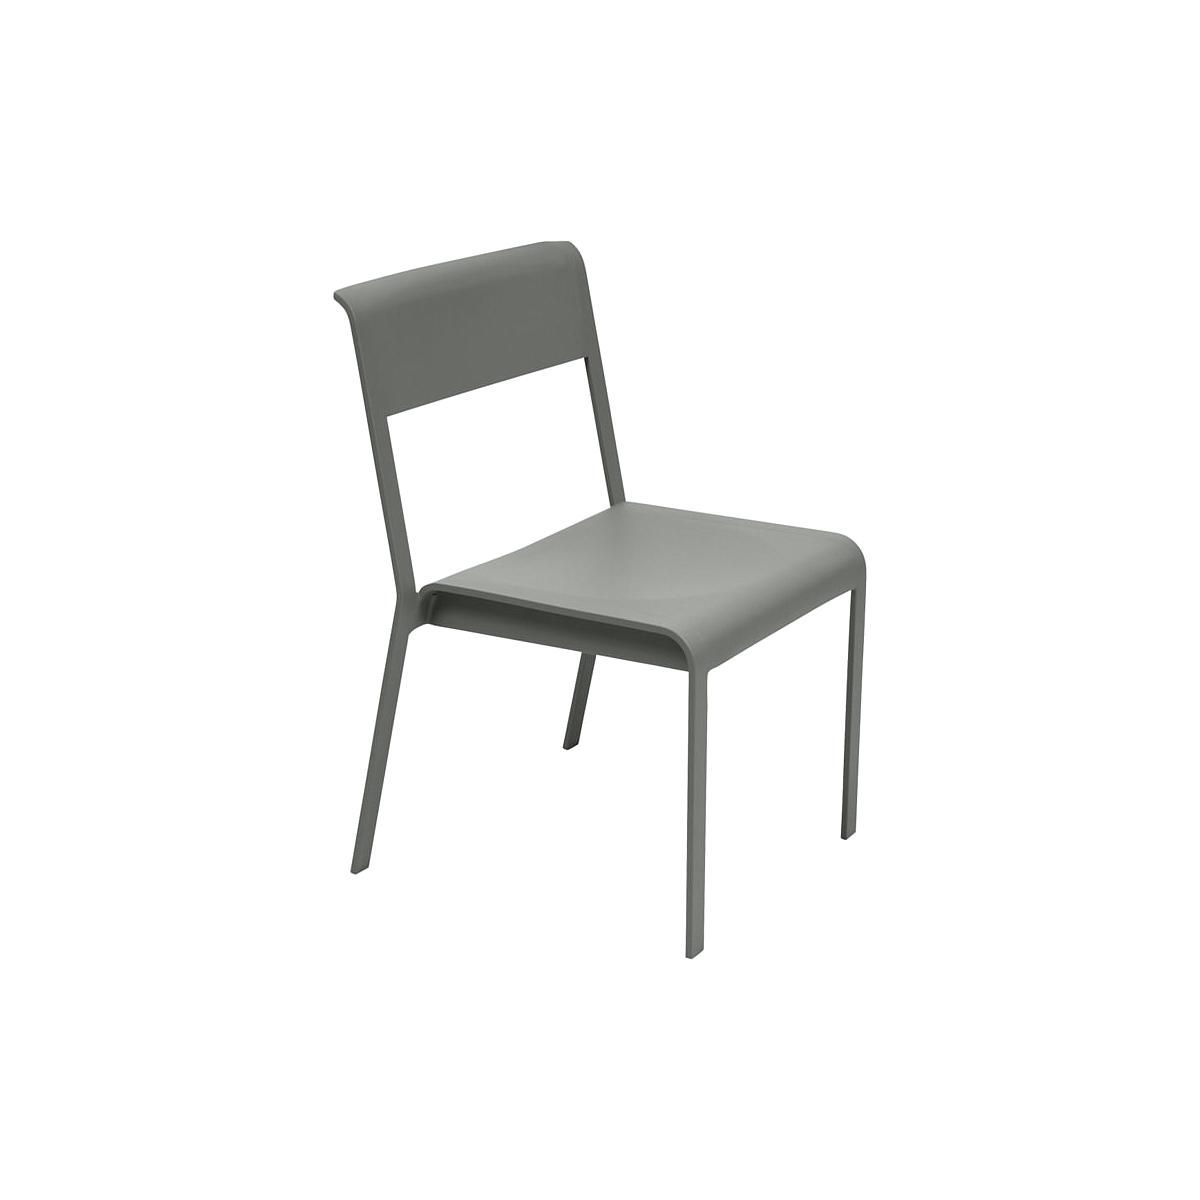 Chaise de jardin BELLEVIE Fermob  romarin